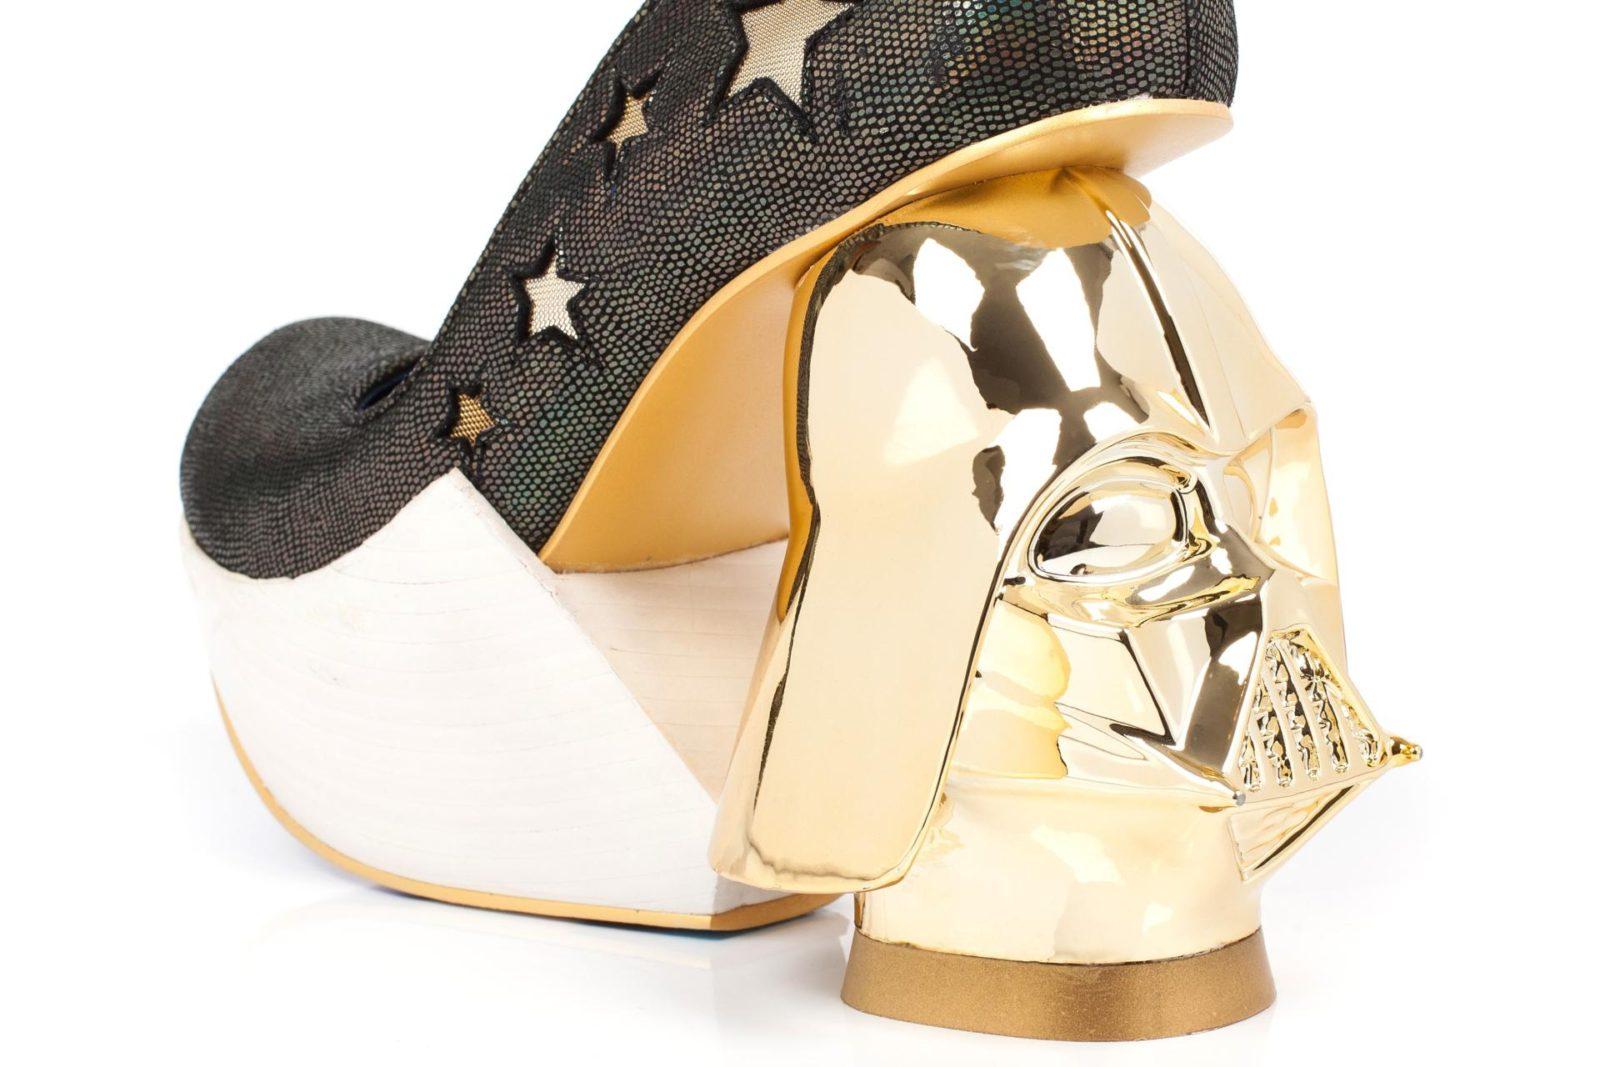 Irregular Choice x Star Wars - 2016 collection Golden Vader heels